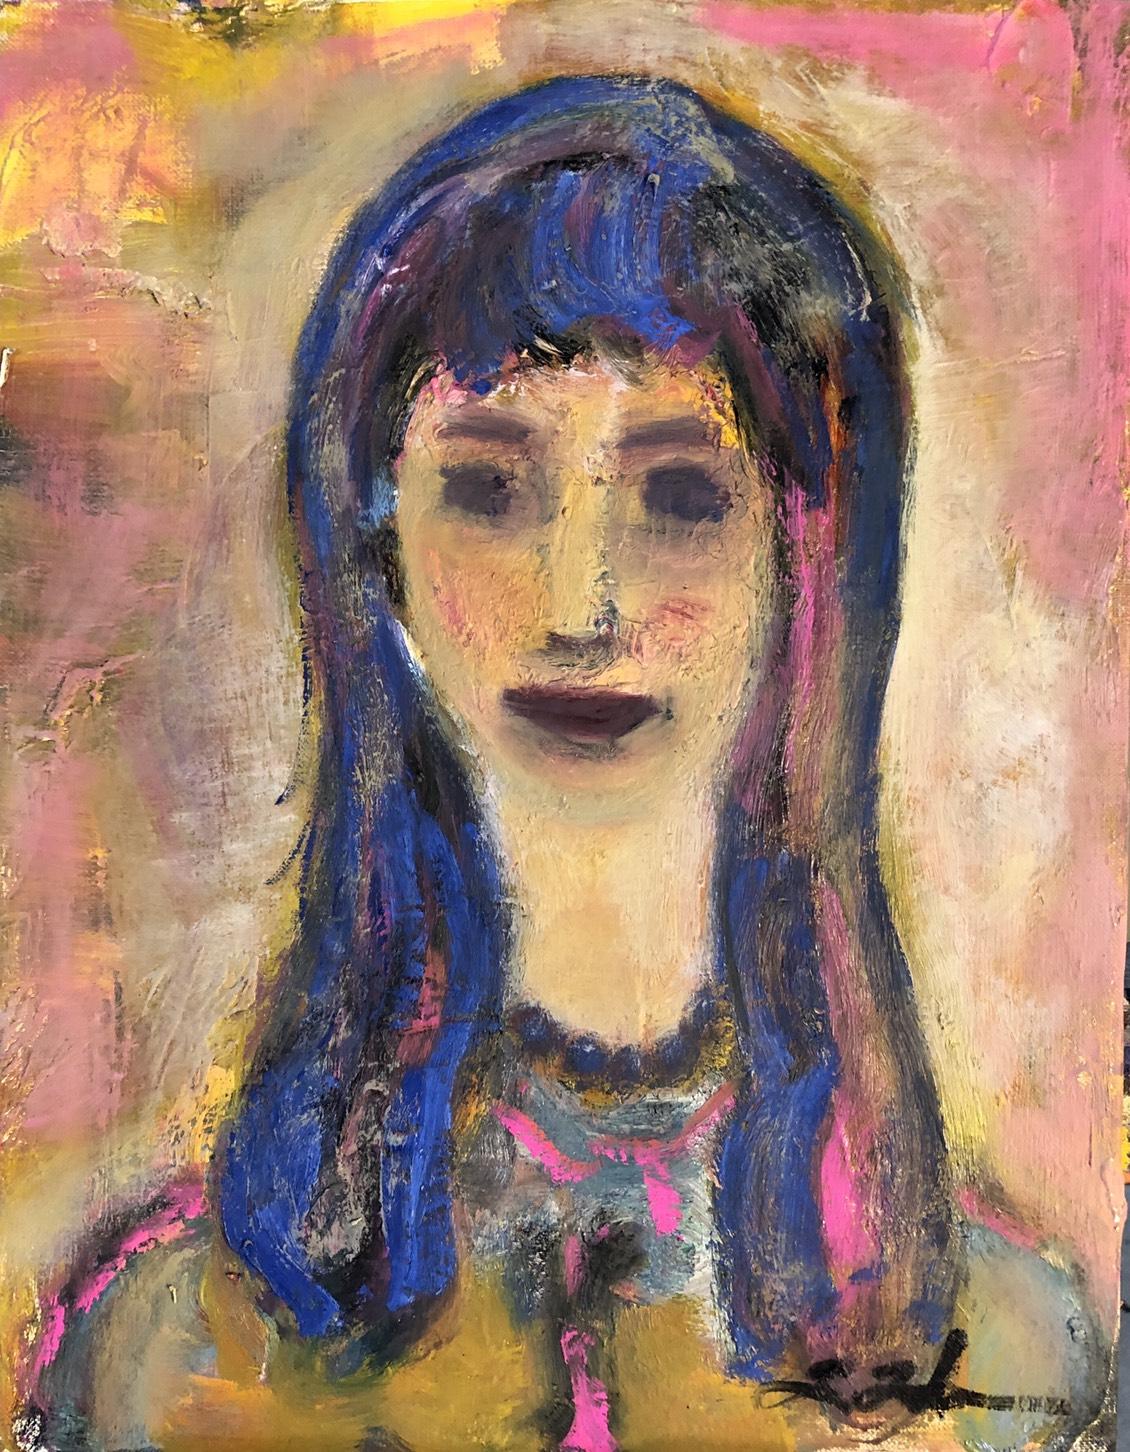 https://auction.catawiki.com/kavels/28695361-takuma-tanaka-a-wowan-who-loves-van-gogh